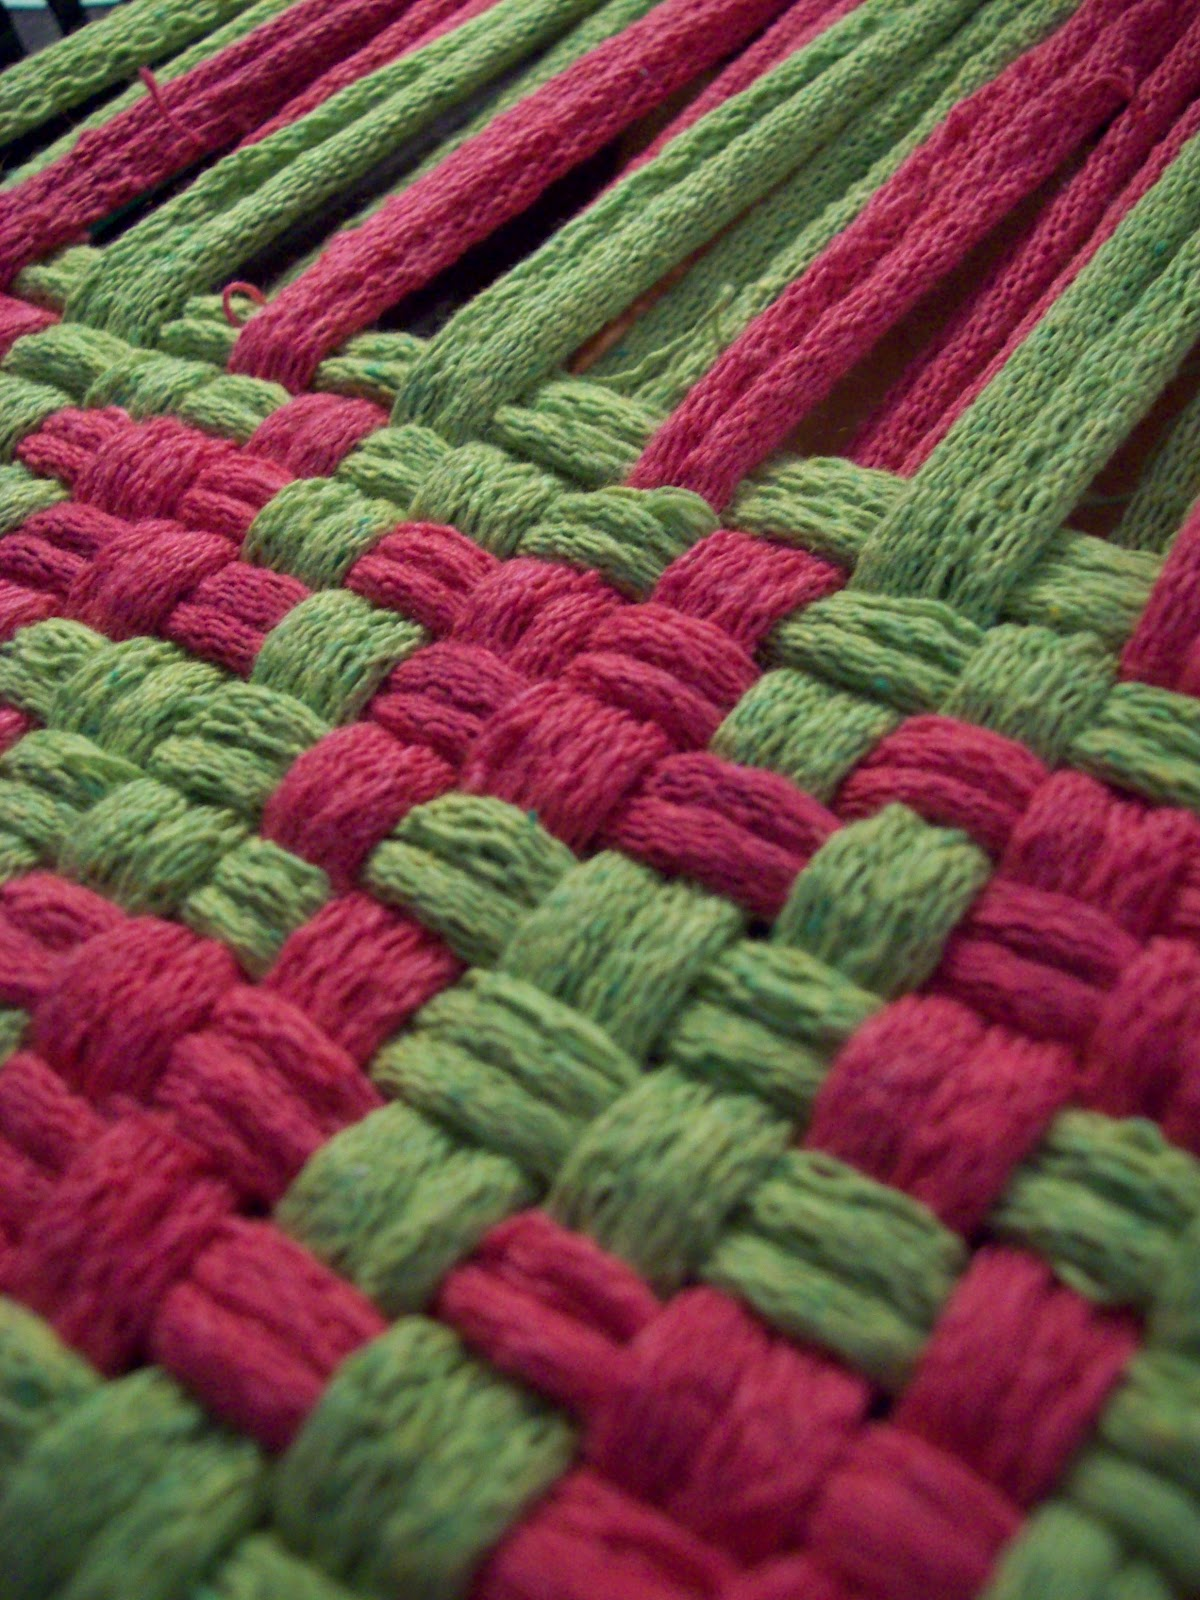 Potholder Loom Patterns Amazing Inspiration Design